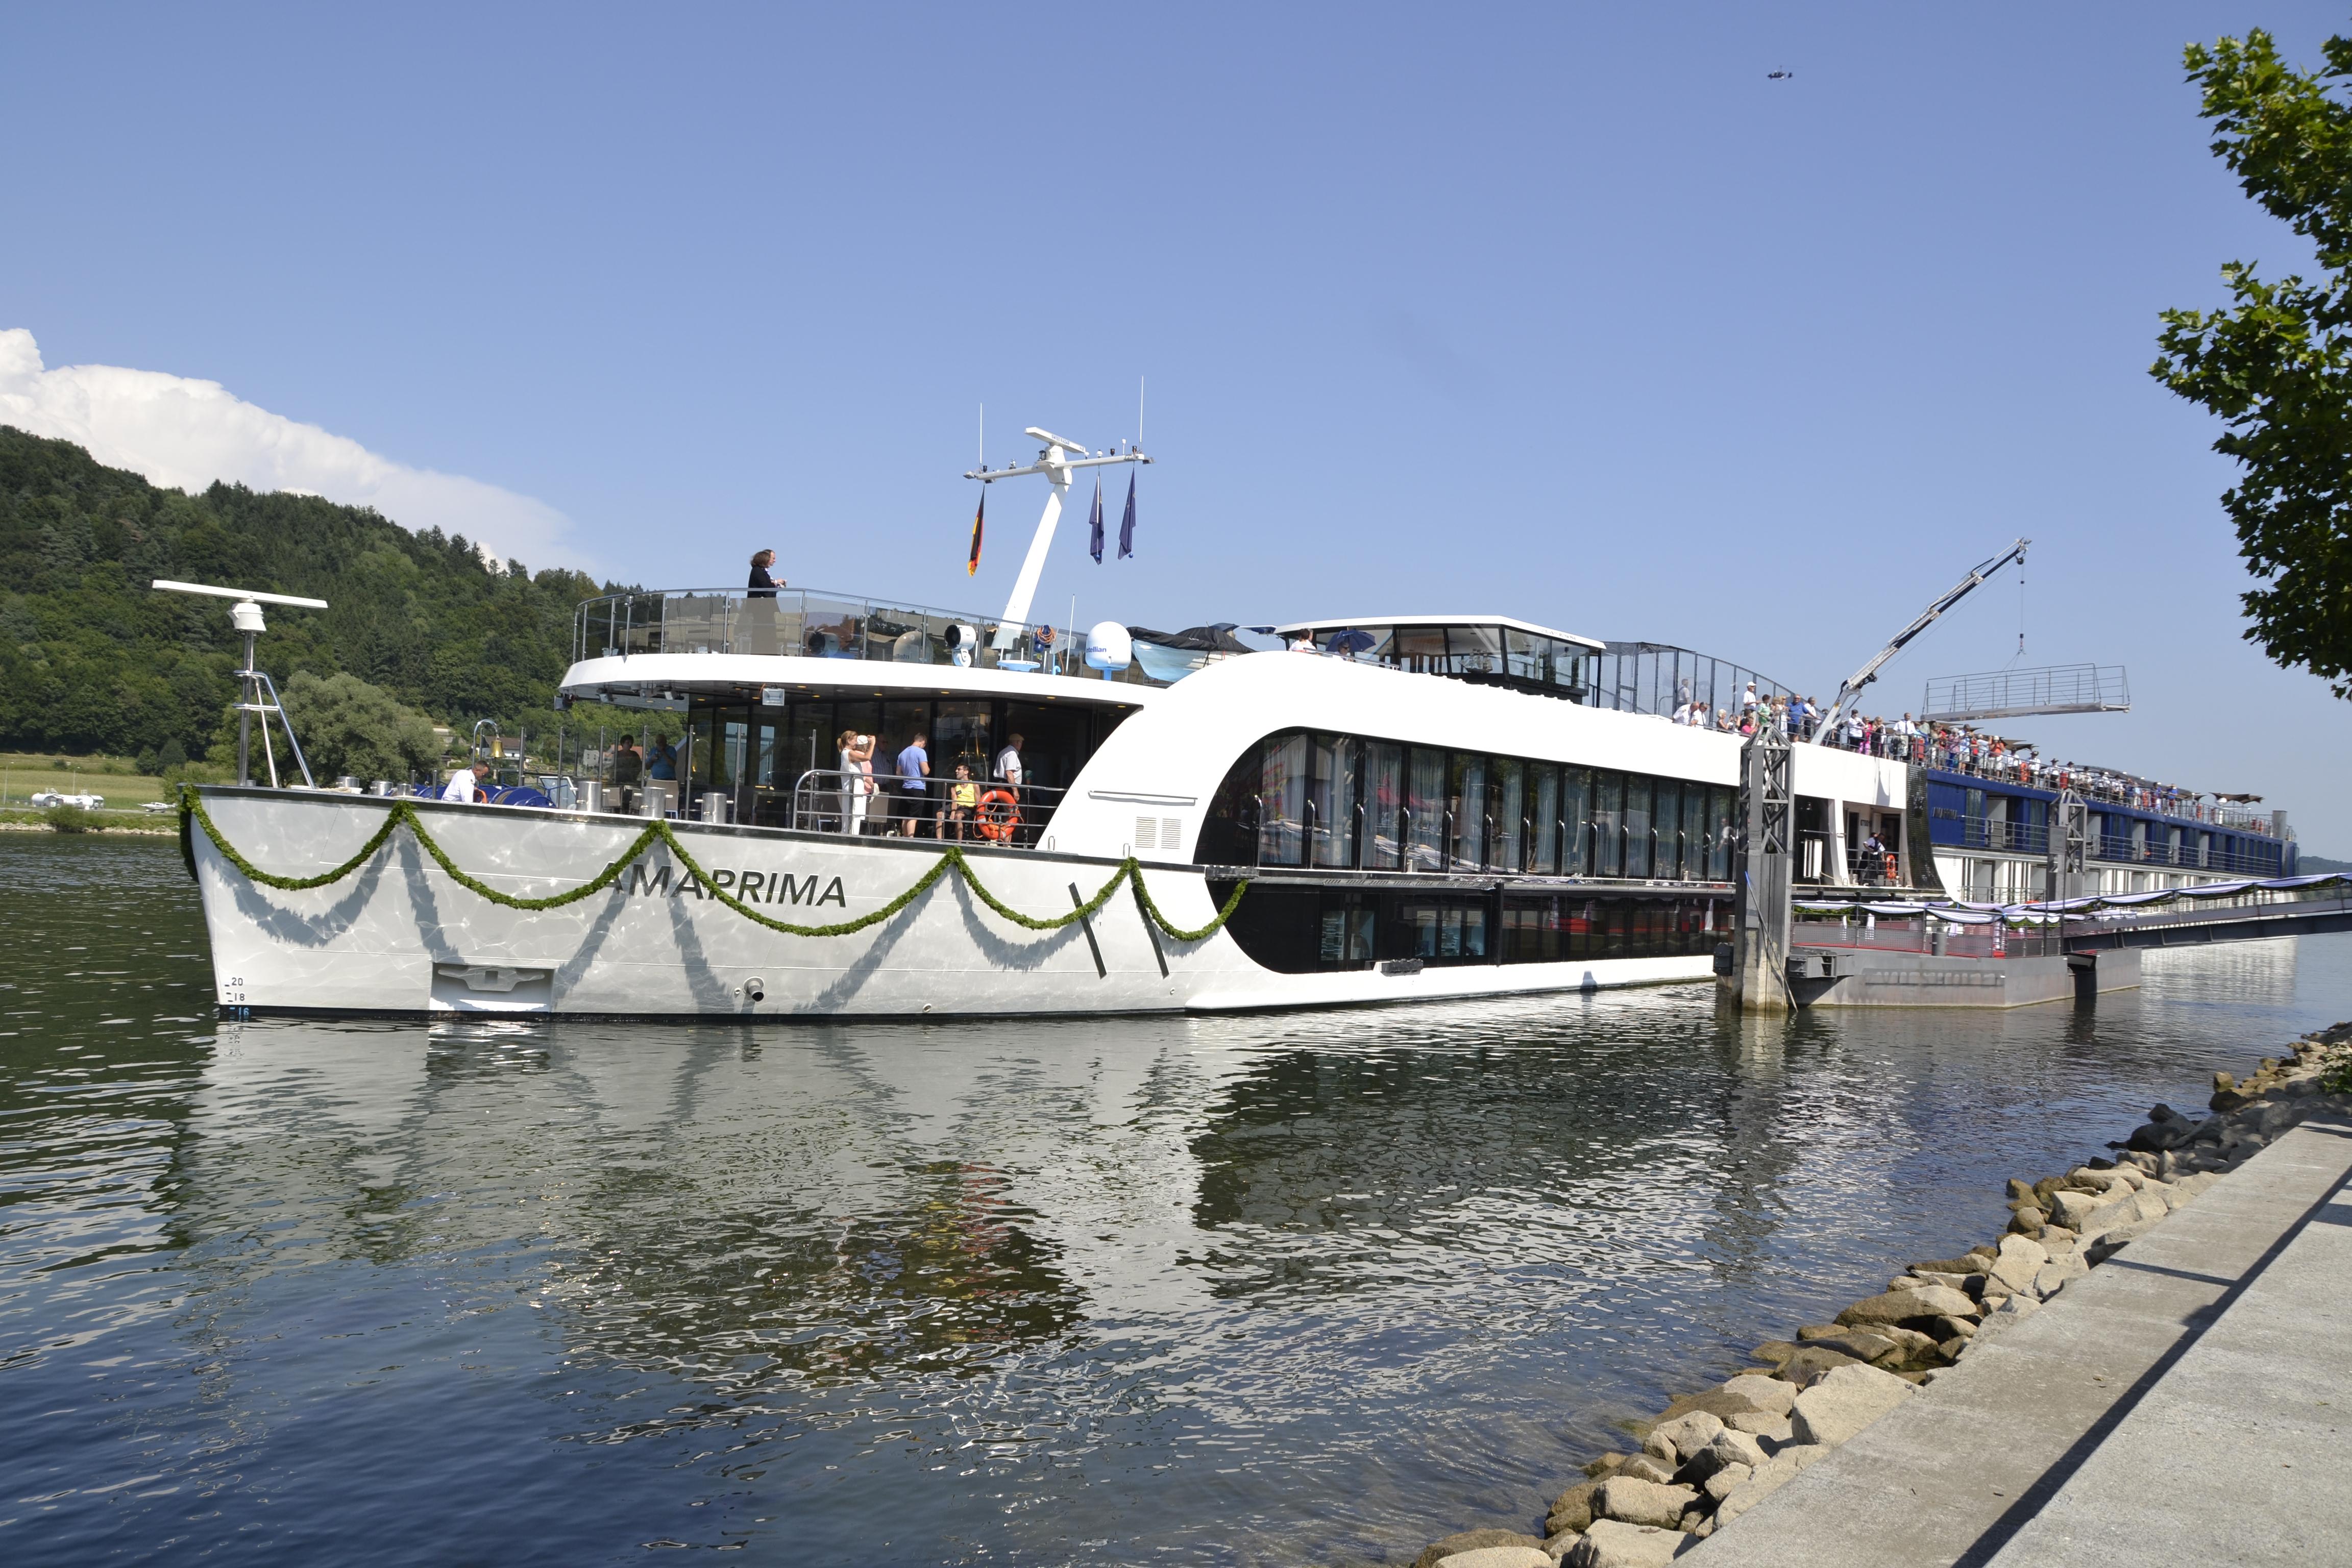 File:AmaWaterways cruise ship AmaPrima -02.JPG - Wikimedia ...